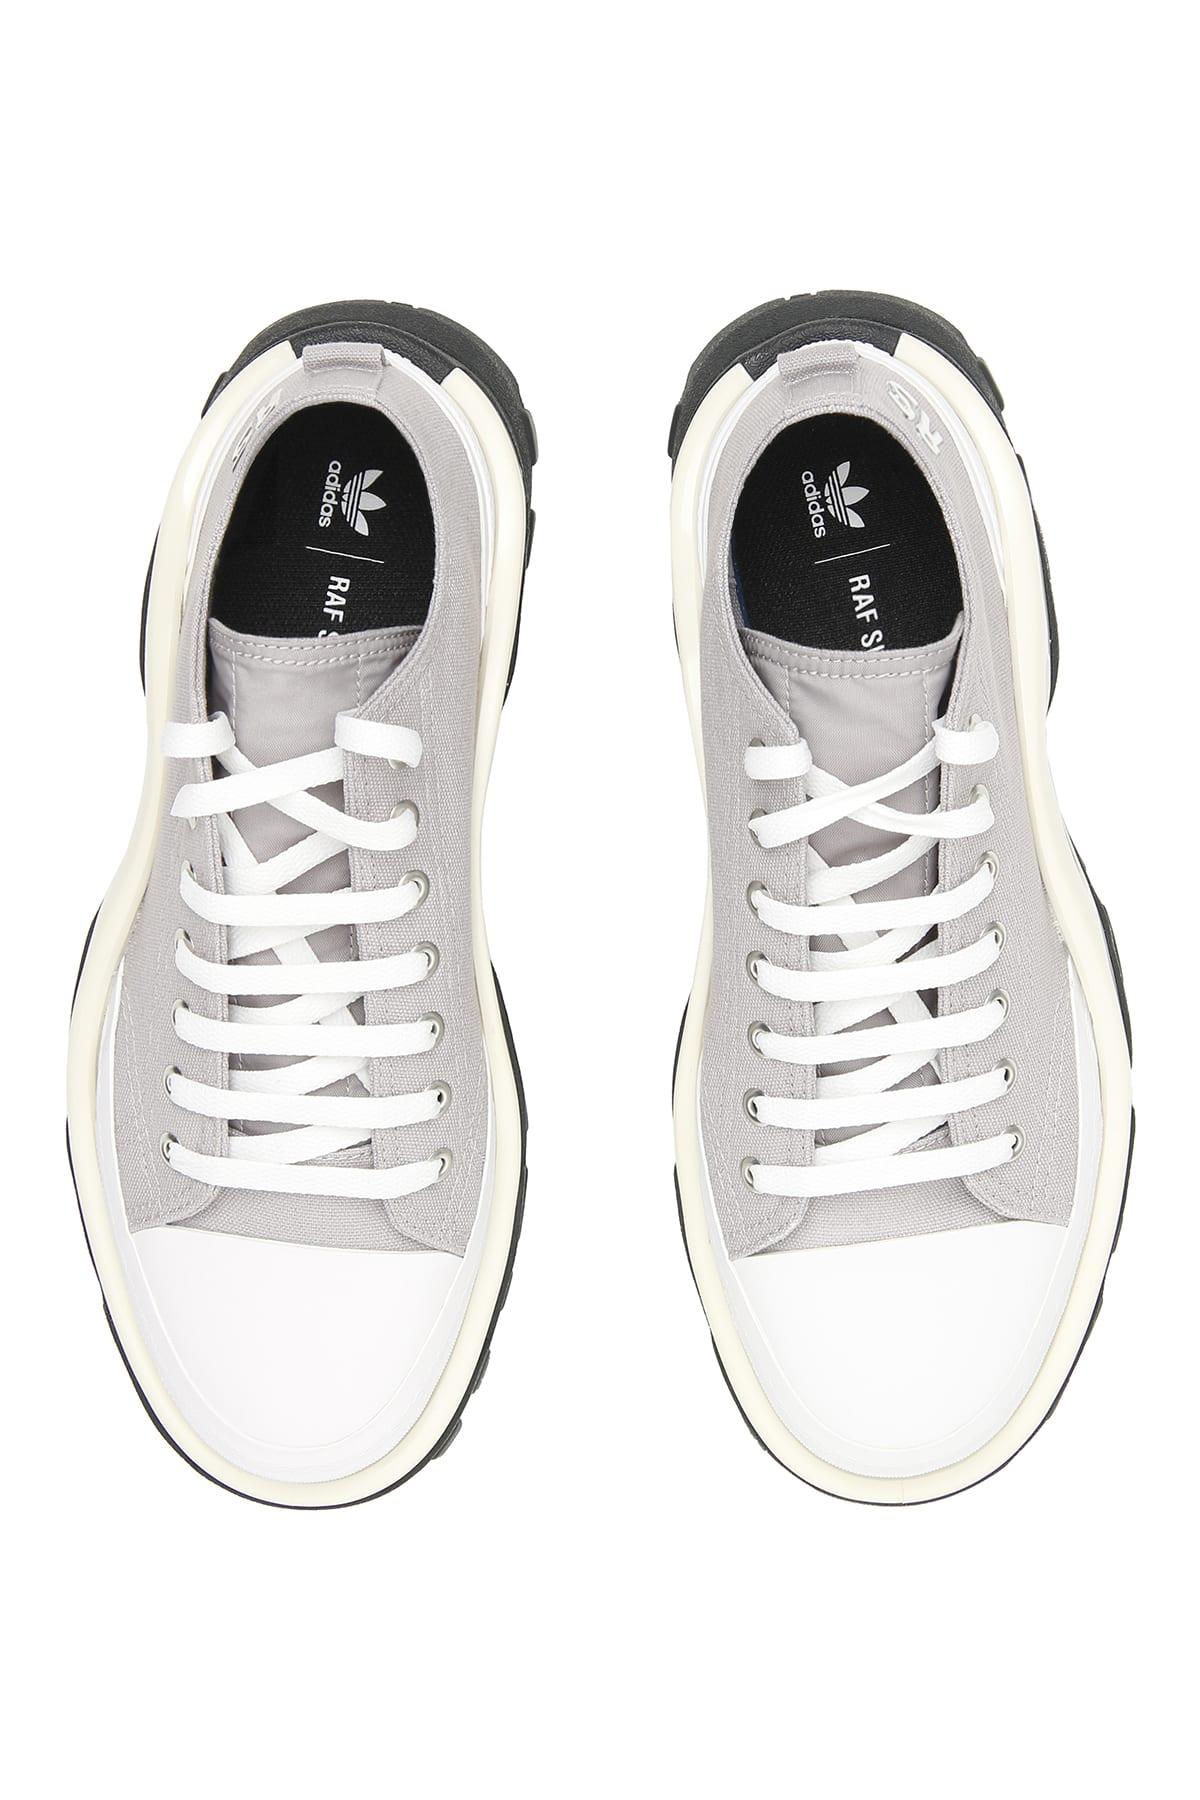 rs detroit runner sneakers